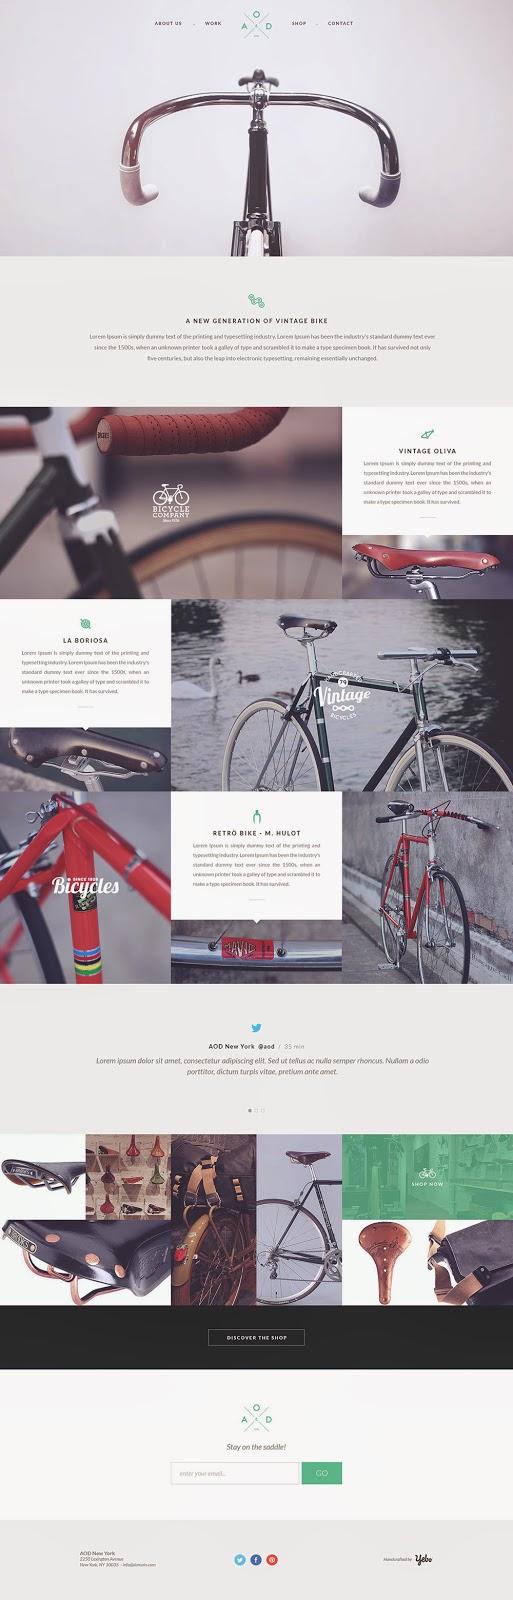 Template PSD sepeda website